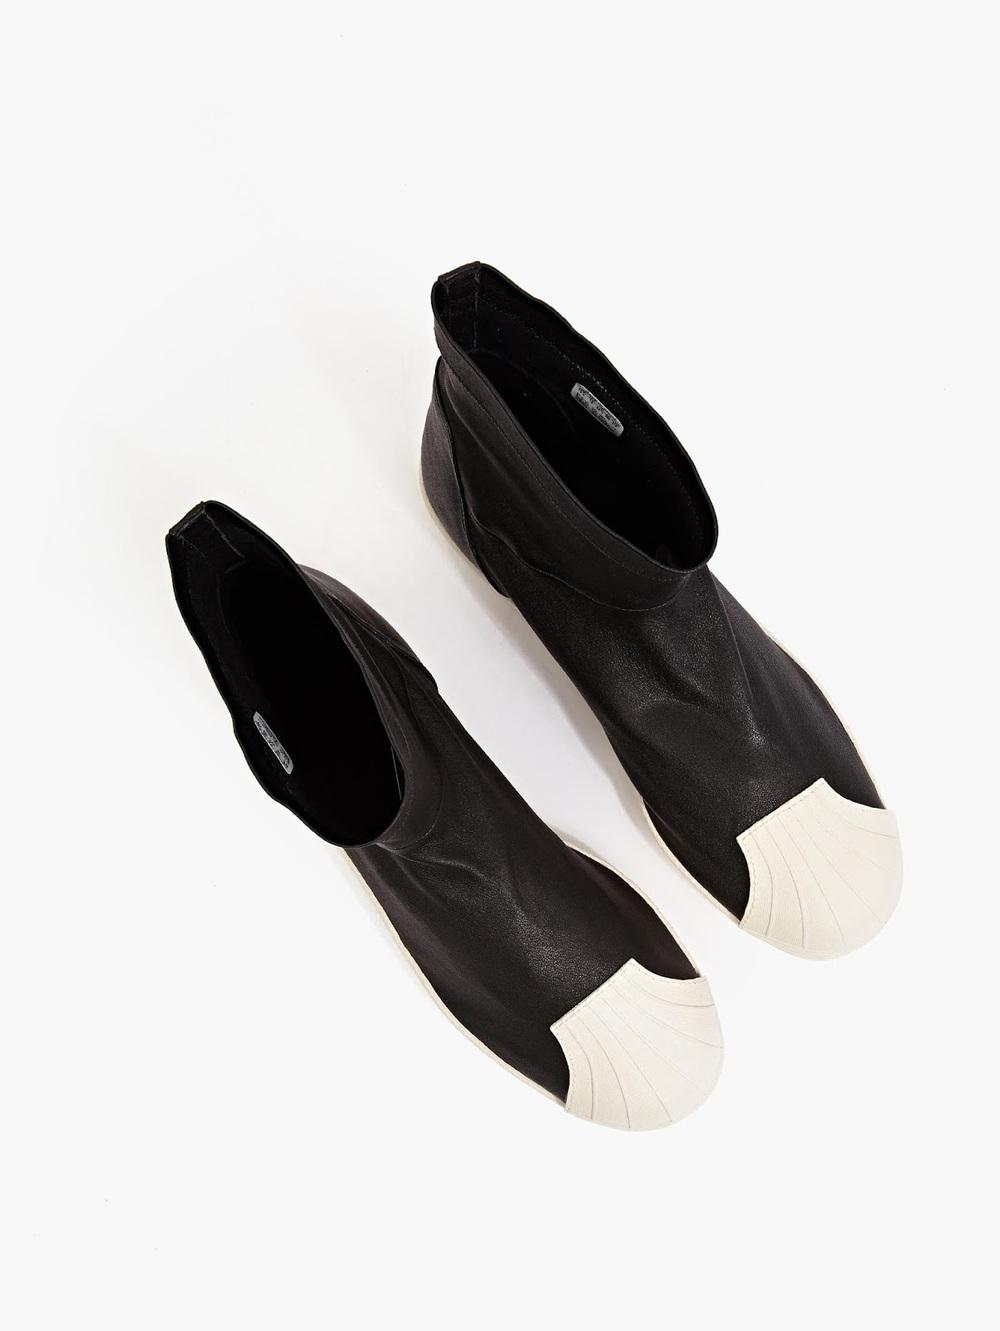 adidas-rick-owens-minimalist-edgy-sneakers8.jpg